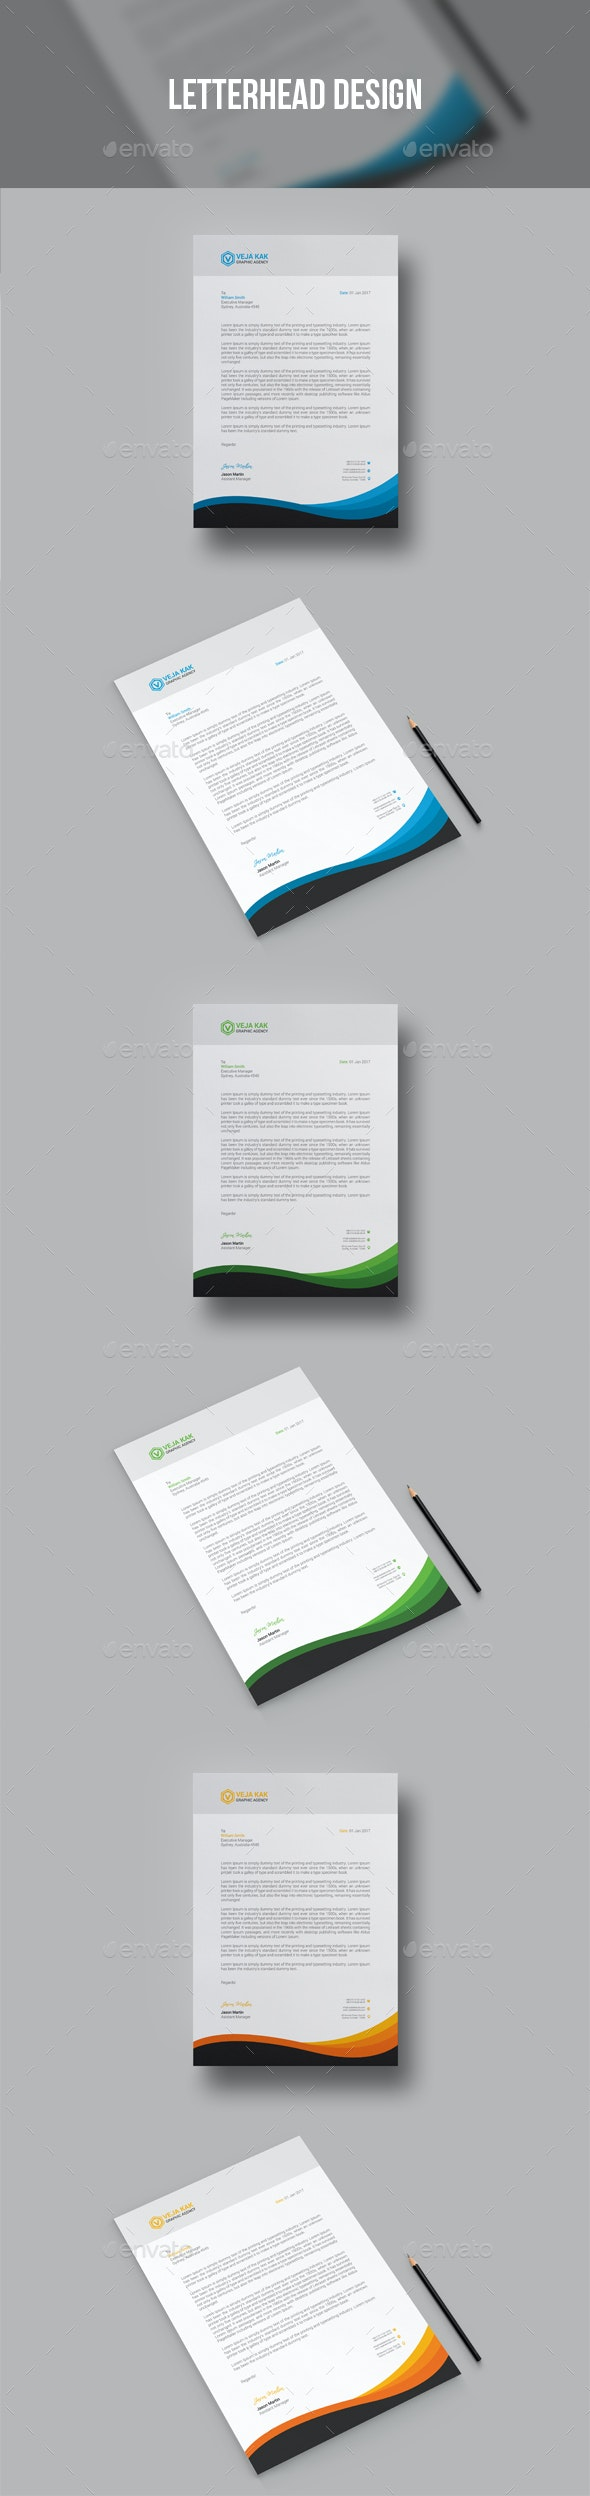 Letterhead Design - Stationery Print Templates